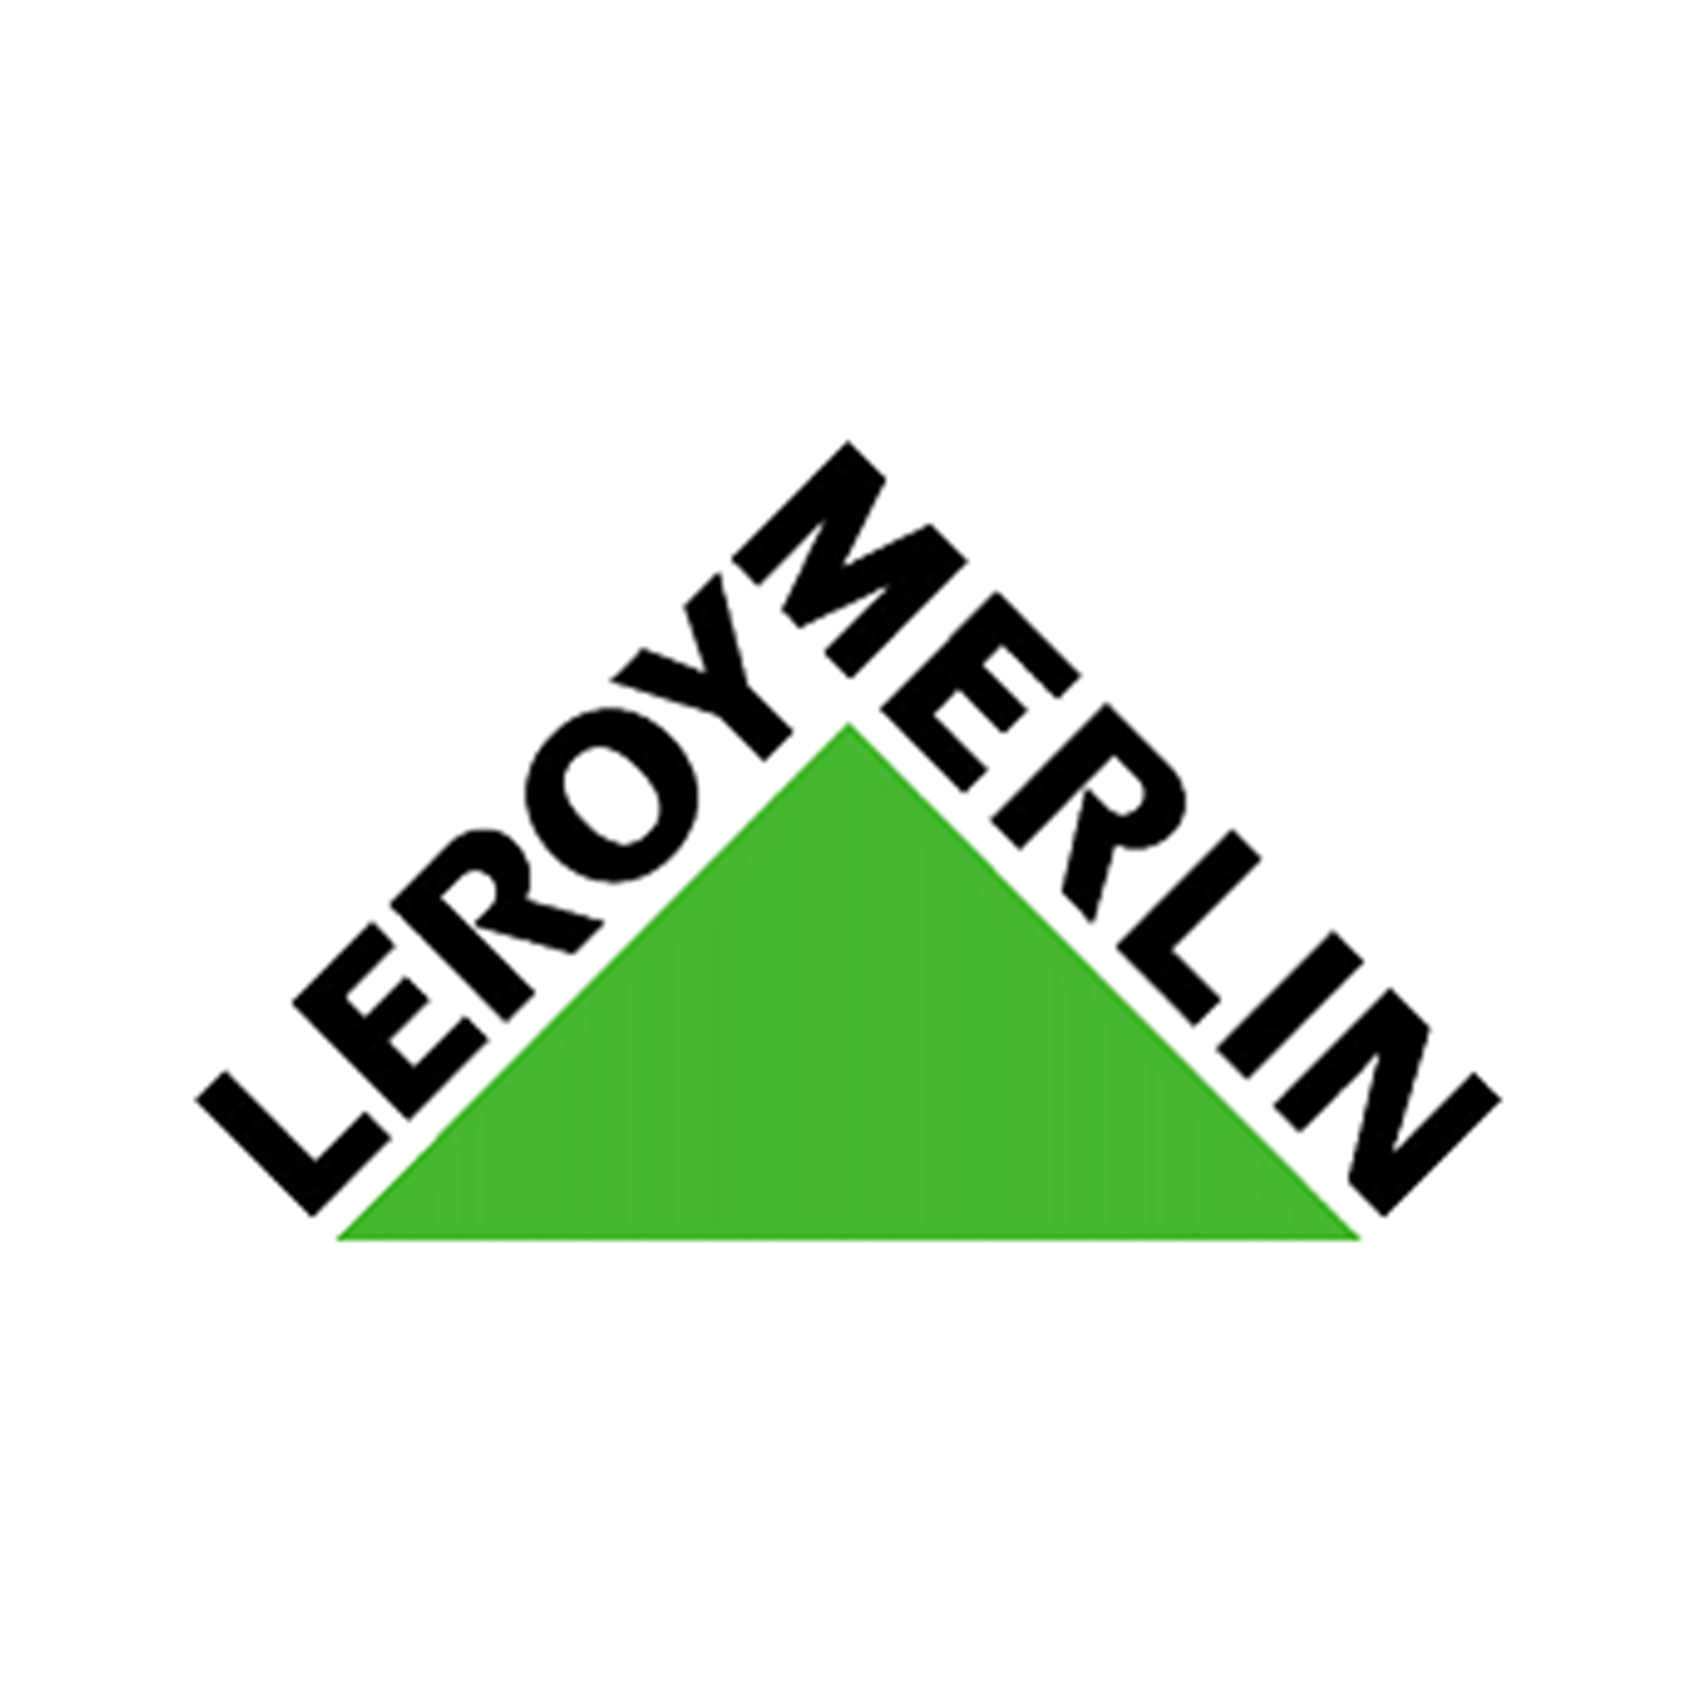 """LEROY MERLIN"" LIDERA PUBLICIDAD EN INSTAGRAM STORIES"